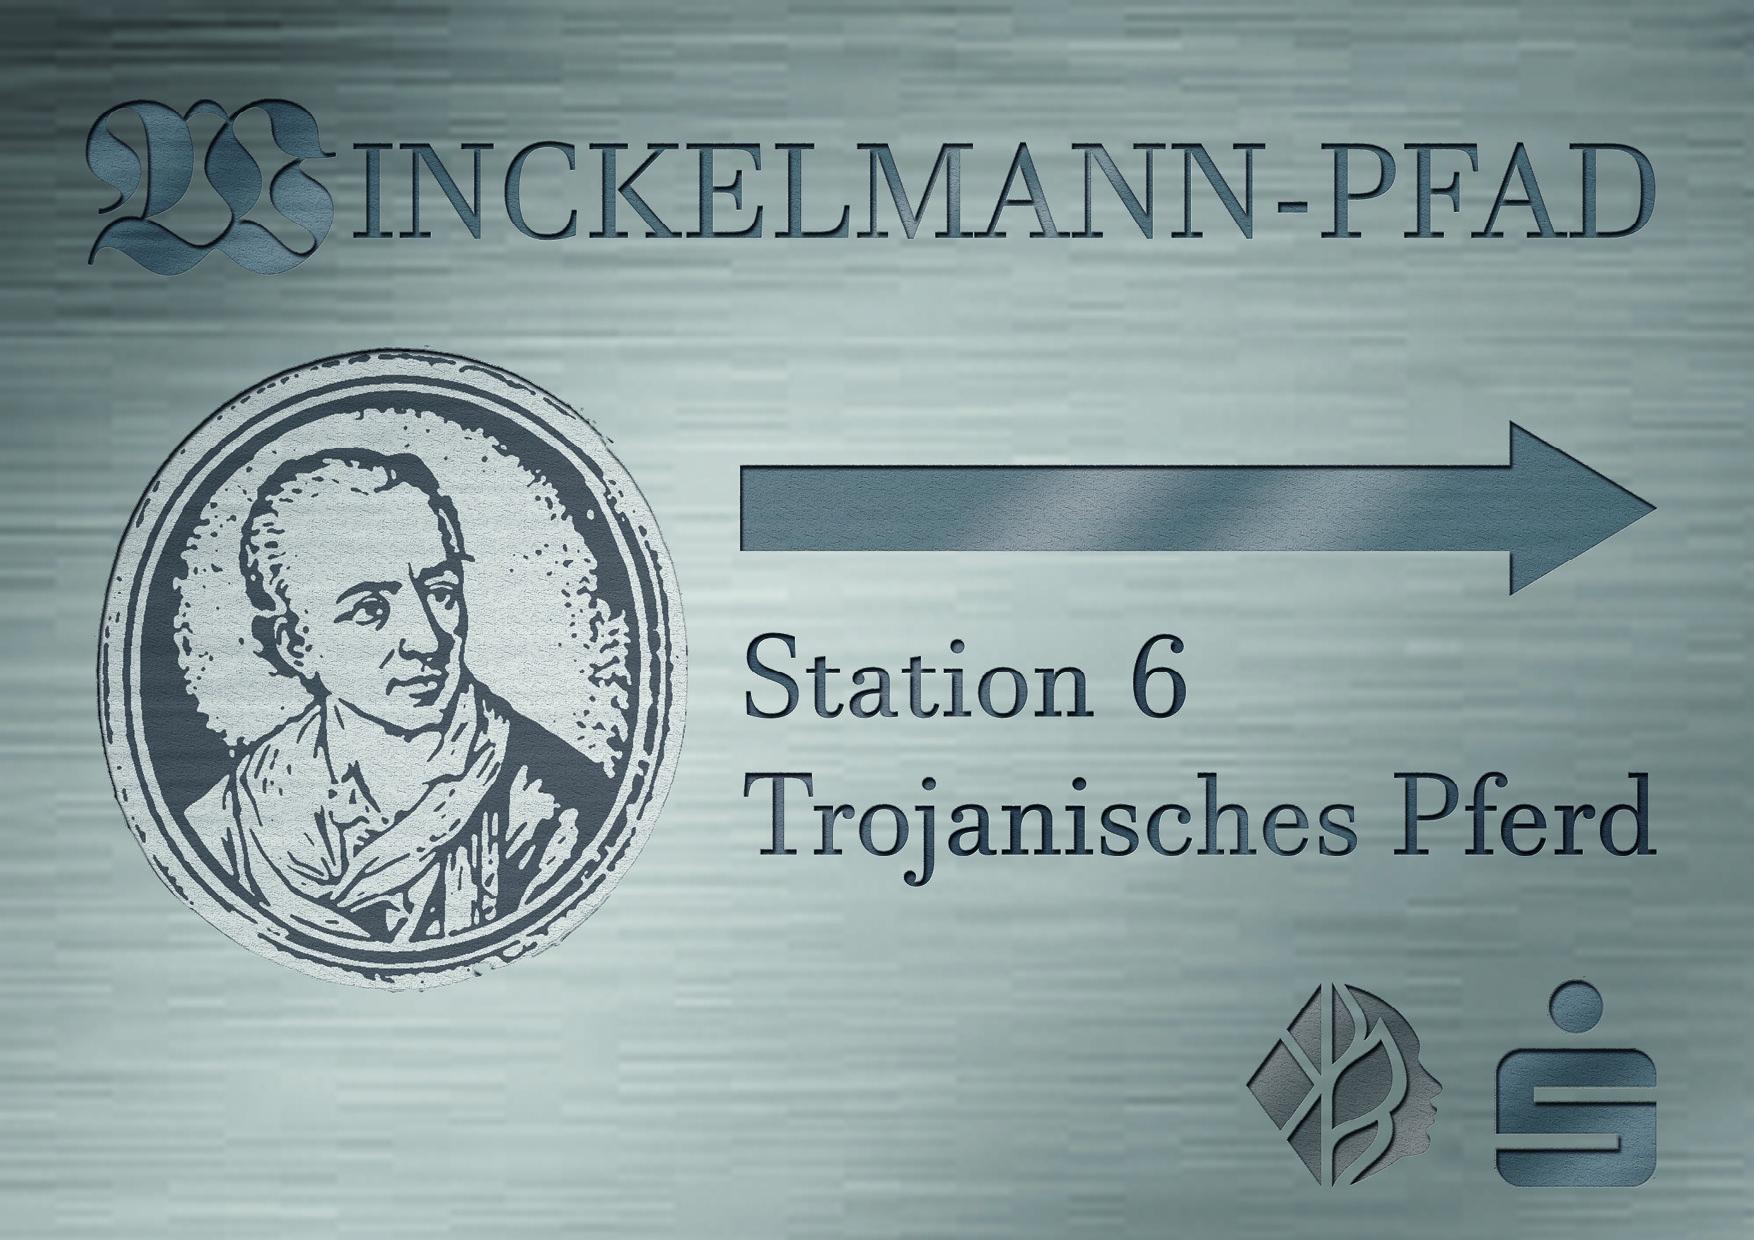 Winckelmann-Pfad Station 6